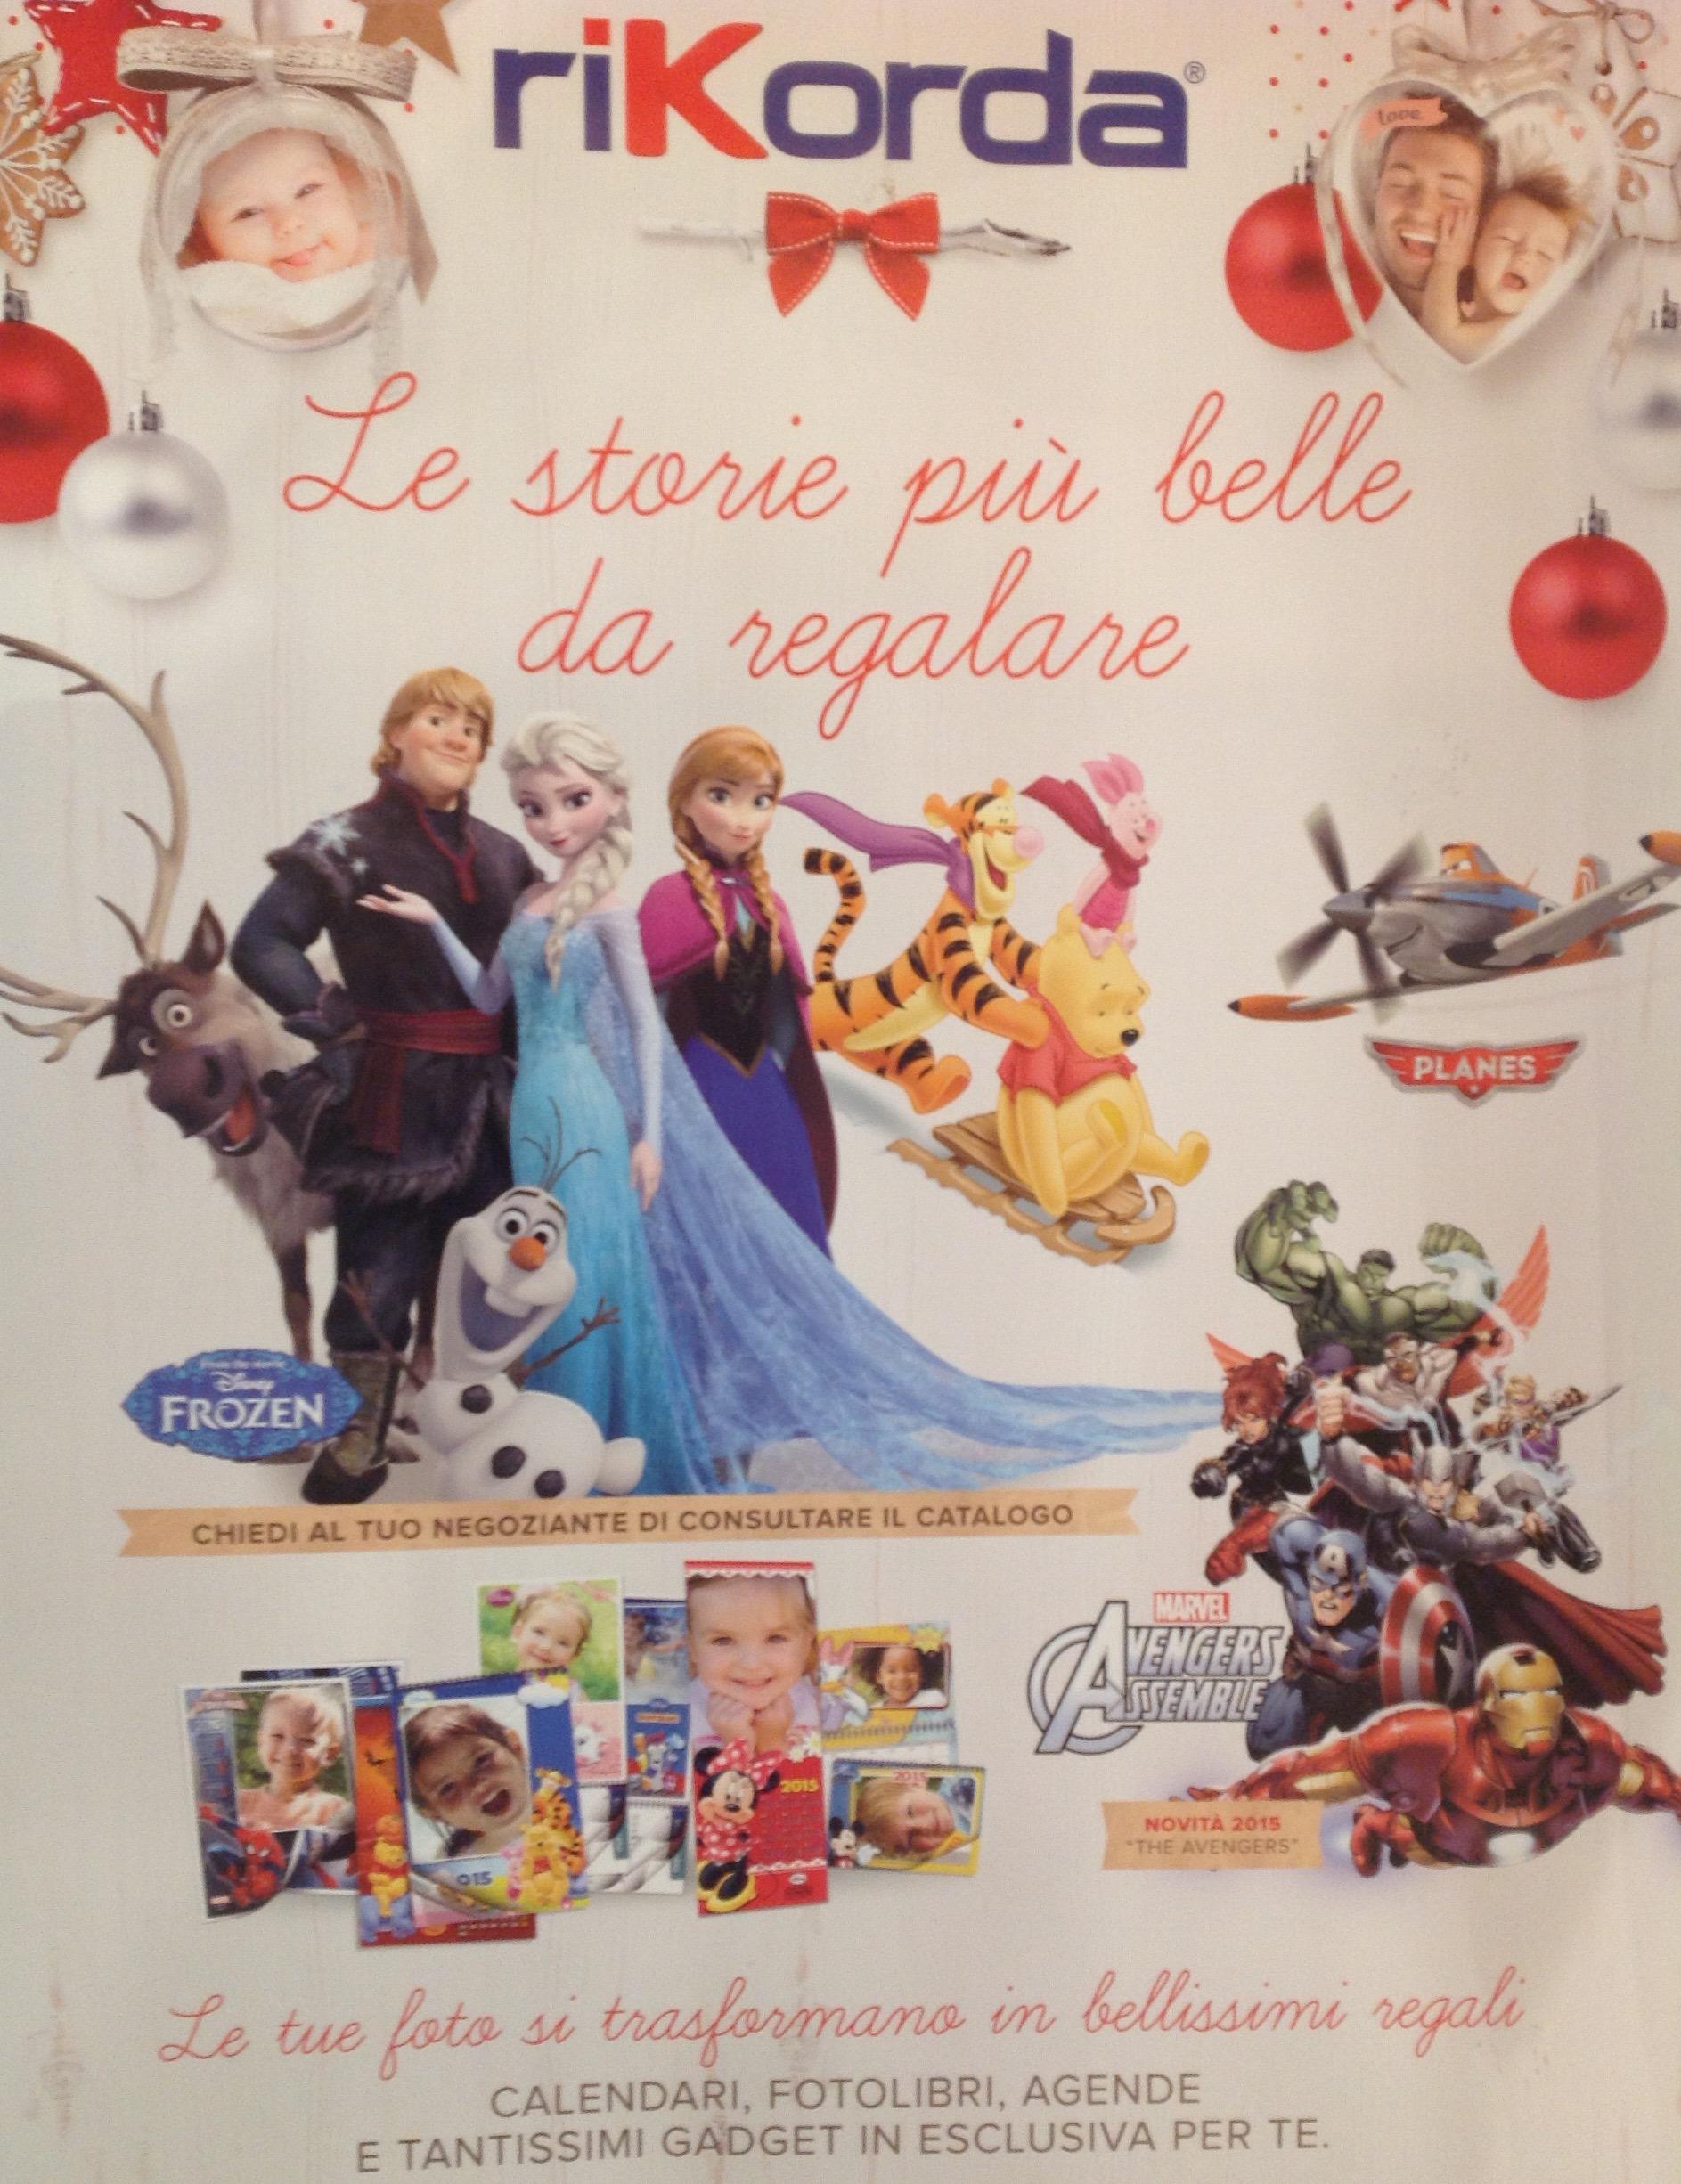 Calendario Rikorda.Calendari E Gadget Di Natale Ottica Galli Srl